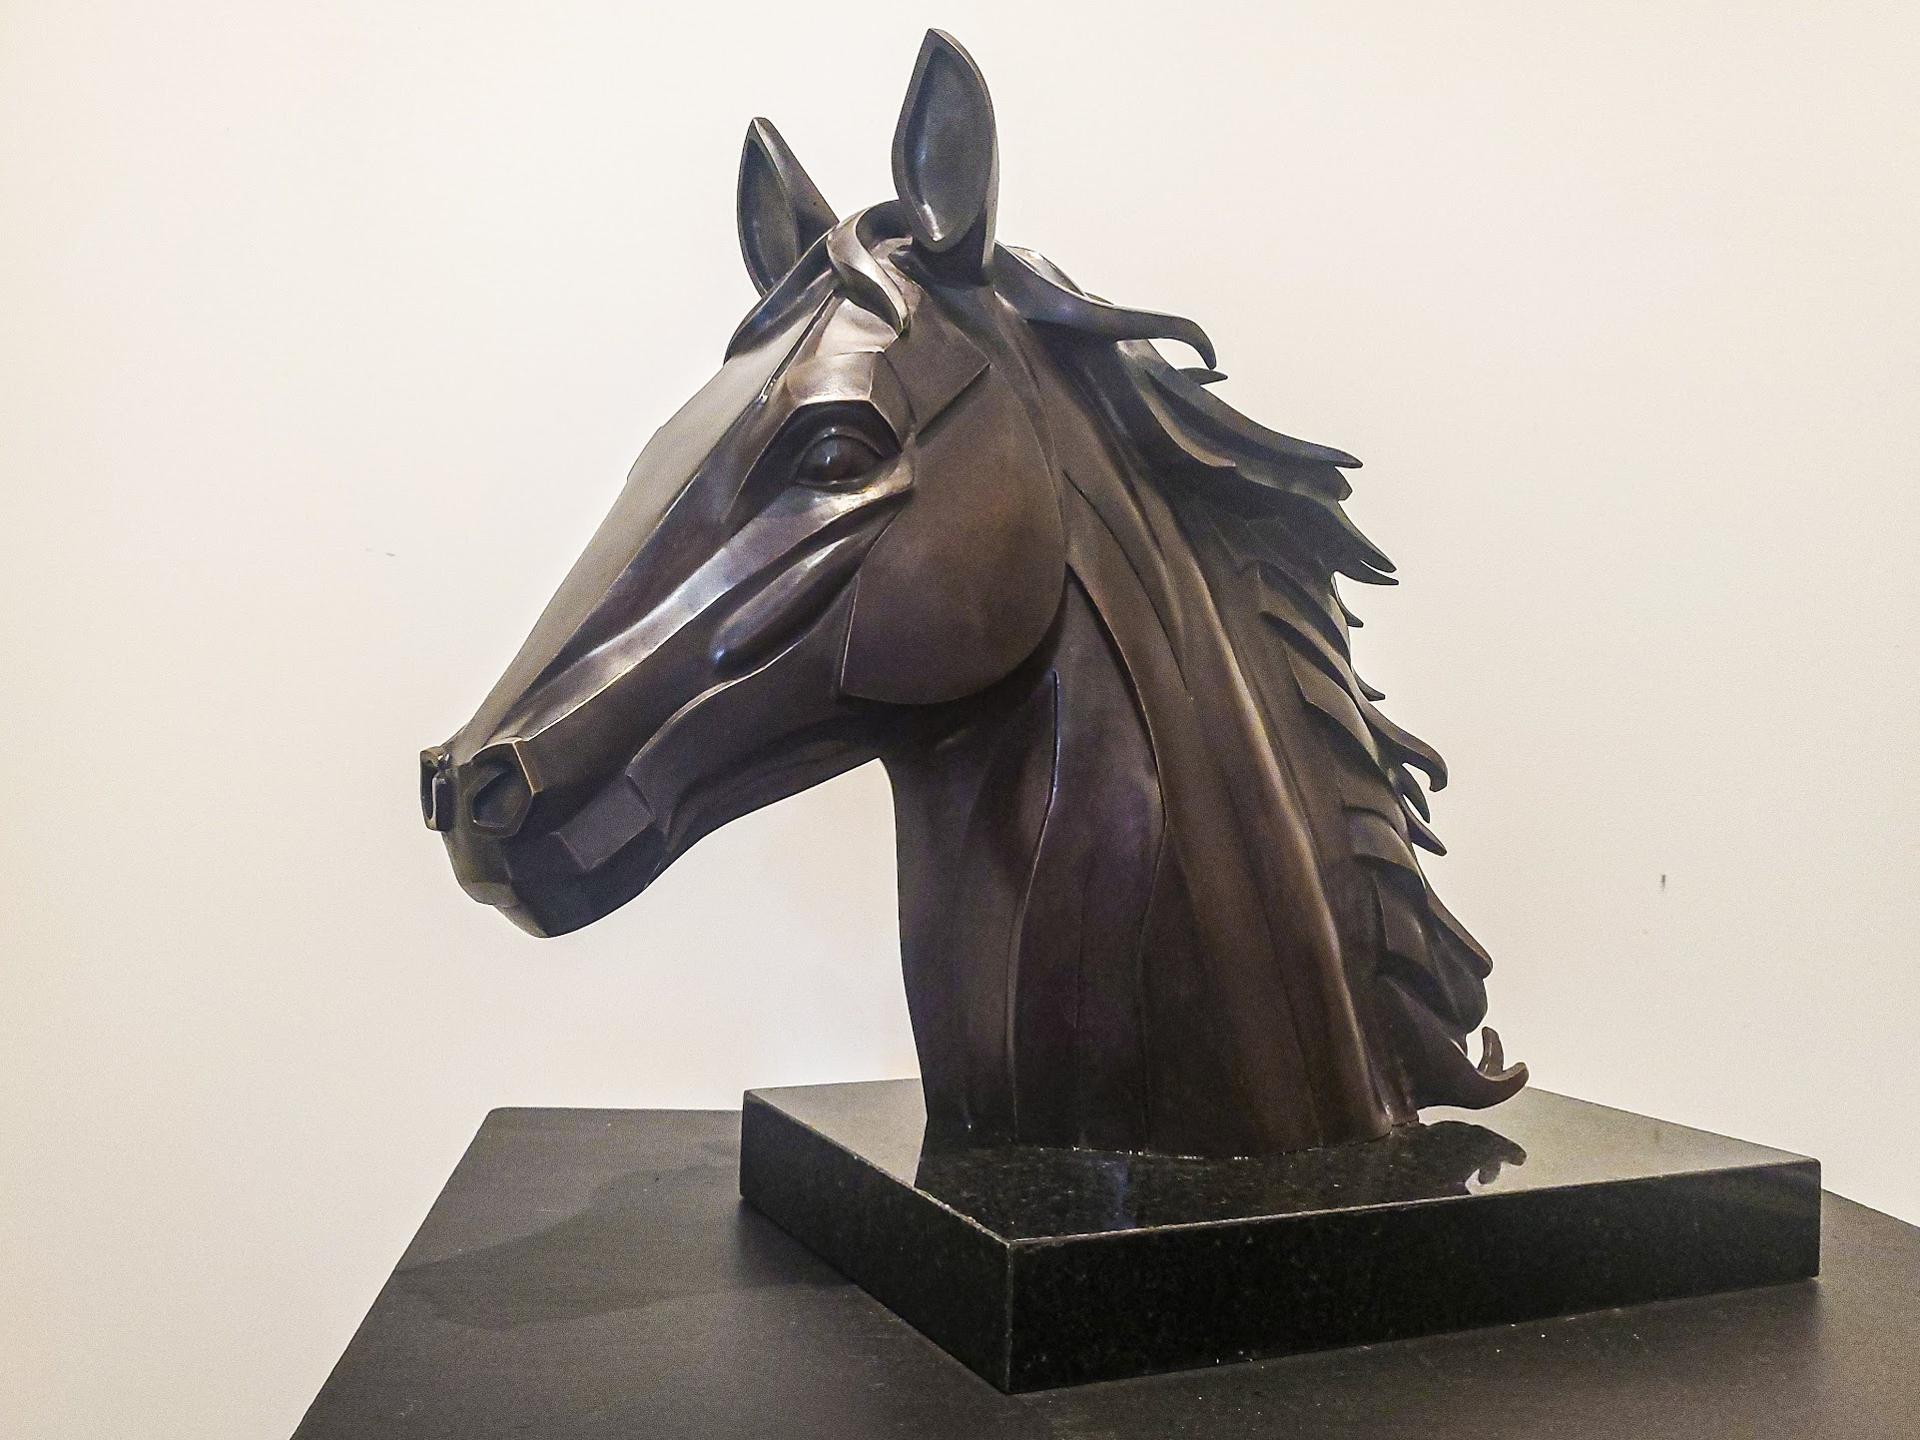 Cubist Horse II by Jennifer Troice